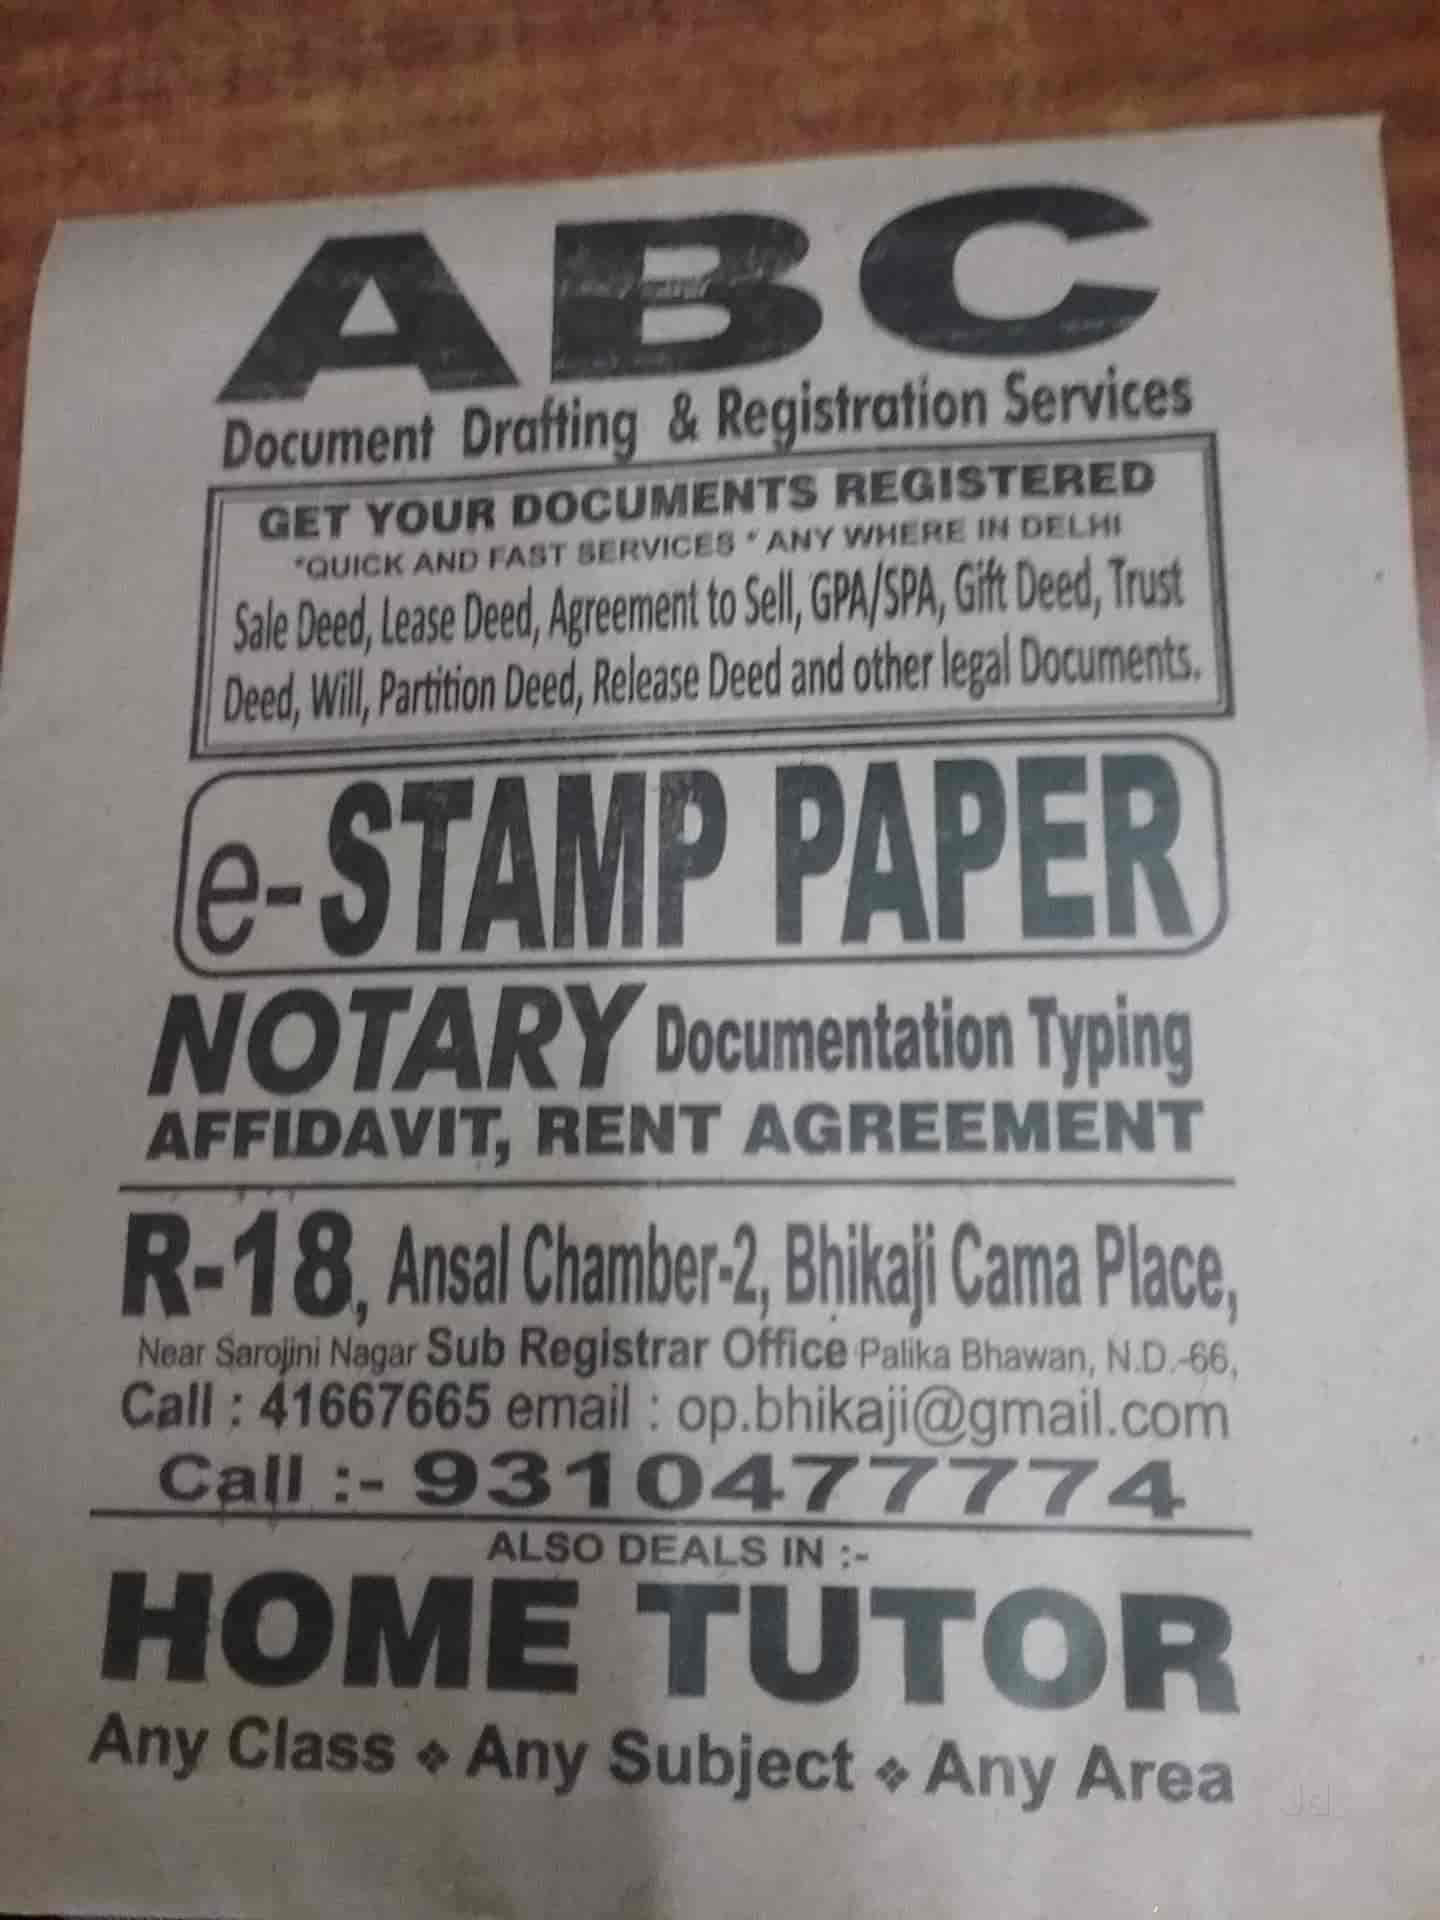 E Stamp Papers Notary Documentation Bhikaji Cama Place Notary